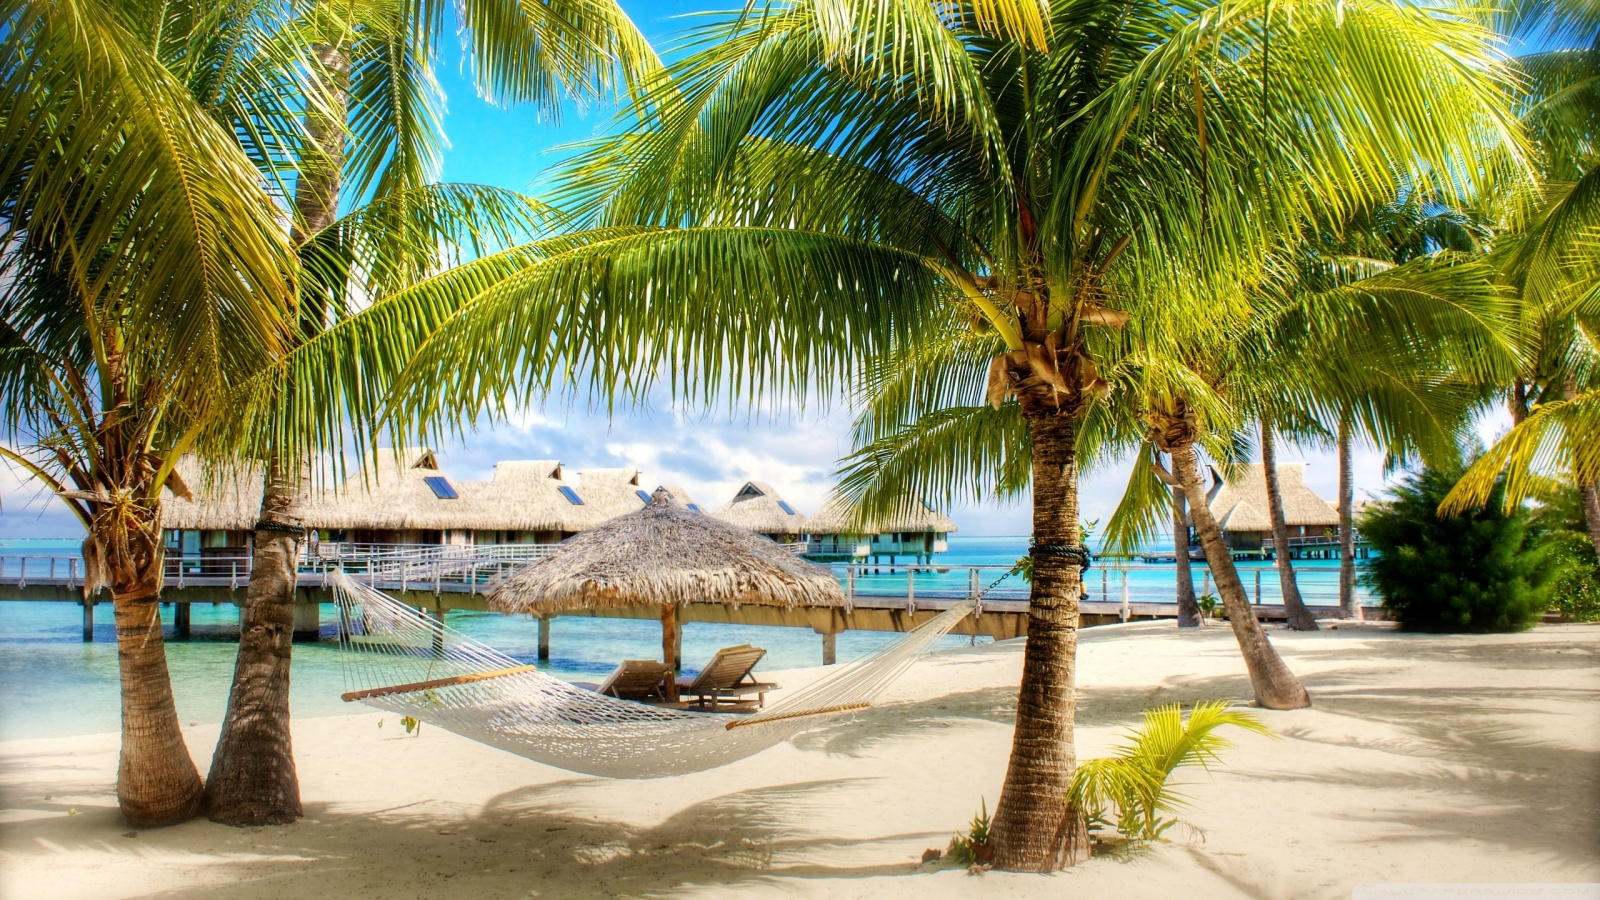 tropical beach resort-wallpaper-1600x900 - 10 000 Fonds d'écran HD gratuits et de qualité ...